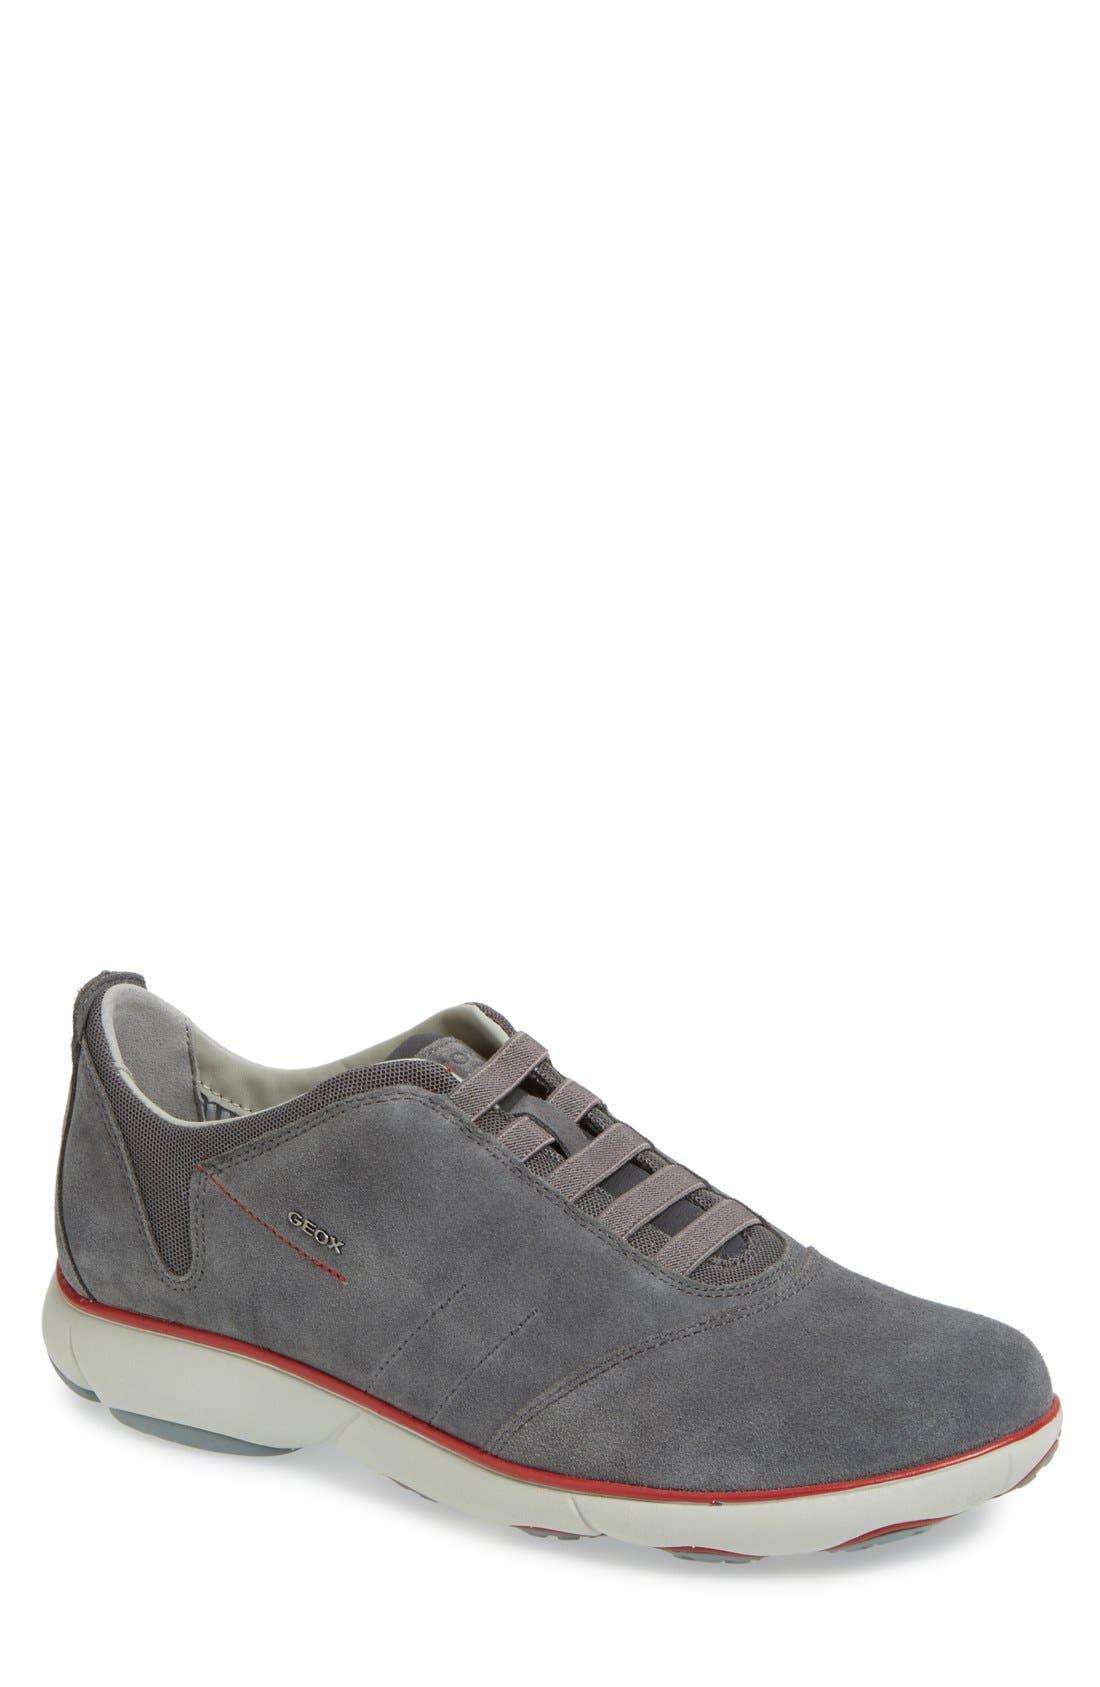 Alternate Image 1 Selected - Geox 'Nebula 7' Slip-On Sneaker (Men)